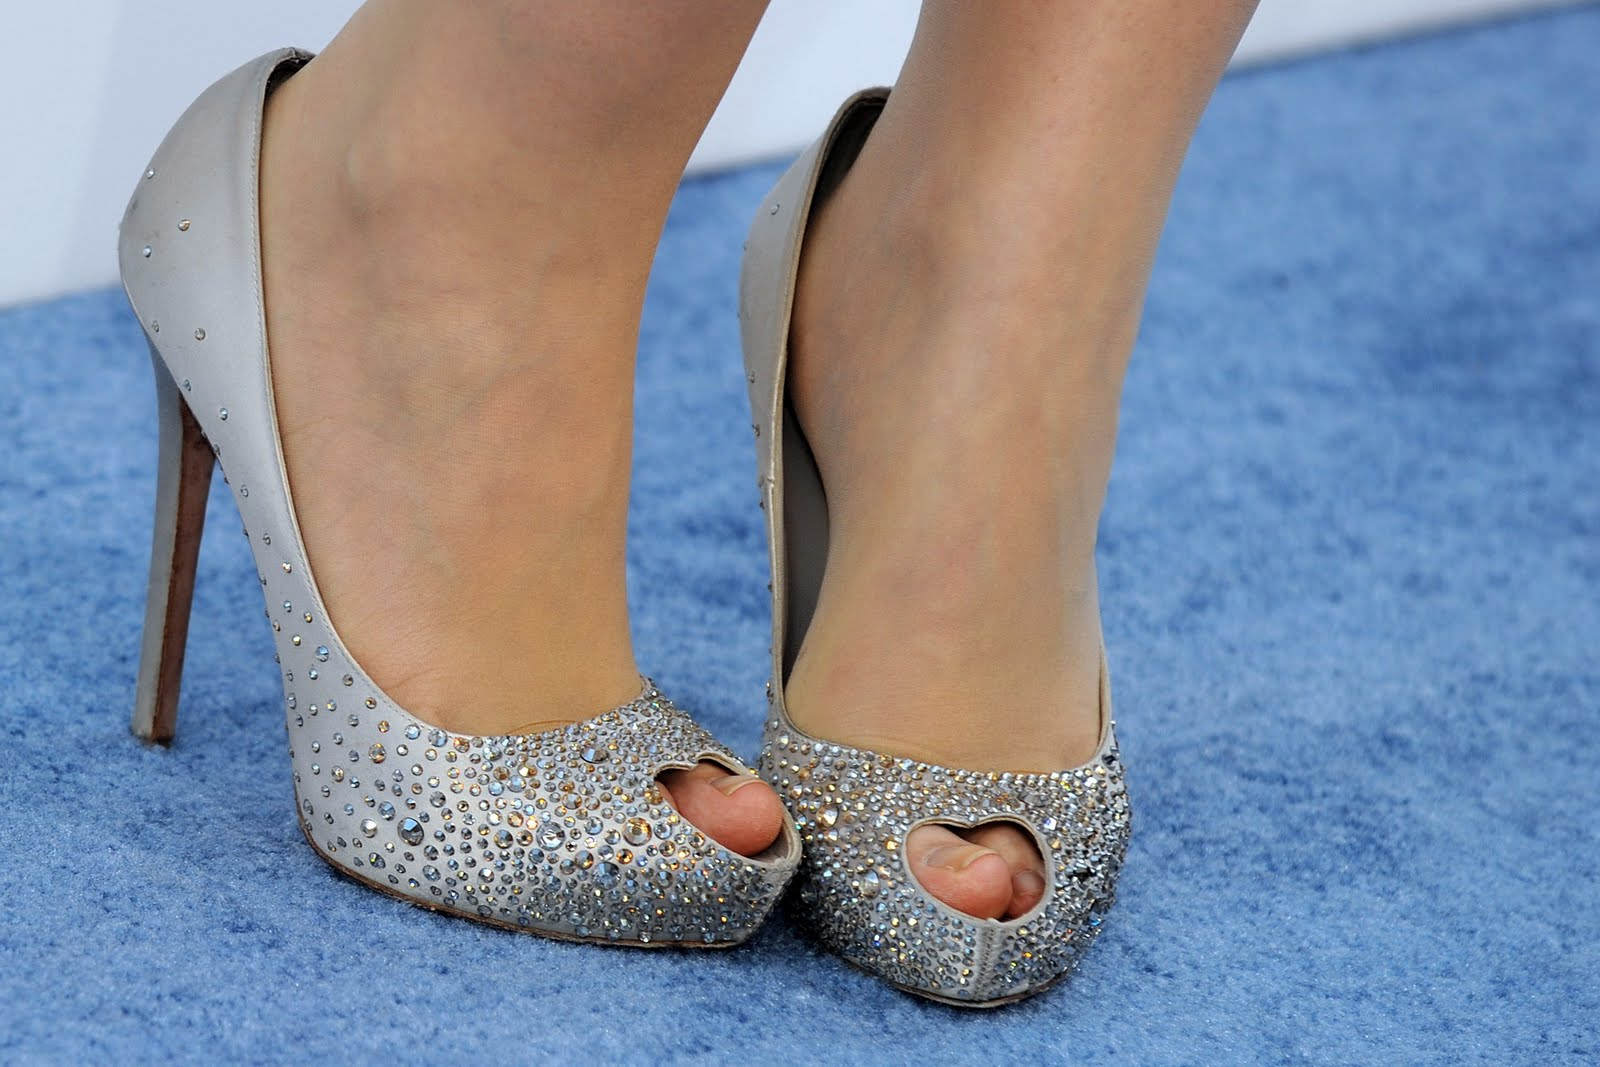 http://4.bp.blogspot.com/-4_8l5czngwE/TfpuskNsPpI/AAAAAAAAA28/G3lYp3A4IFM/s1600/Natasha-Bedingfield-Feet-400530.jpg